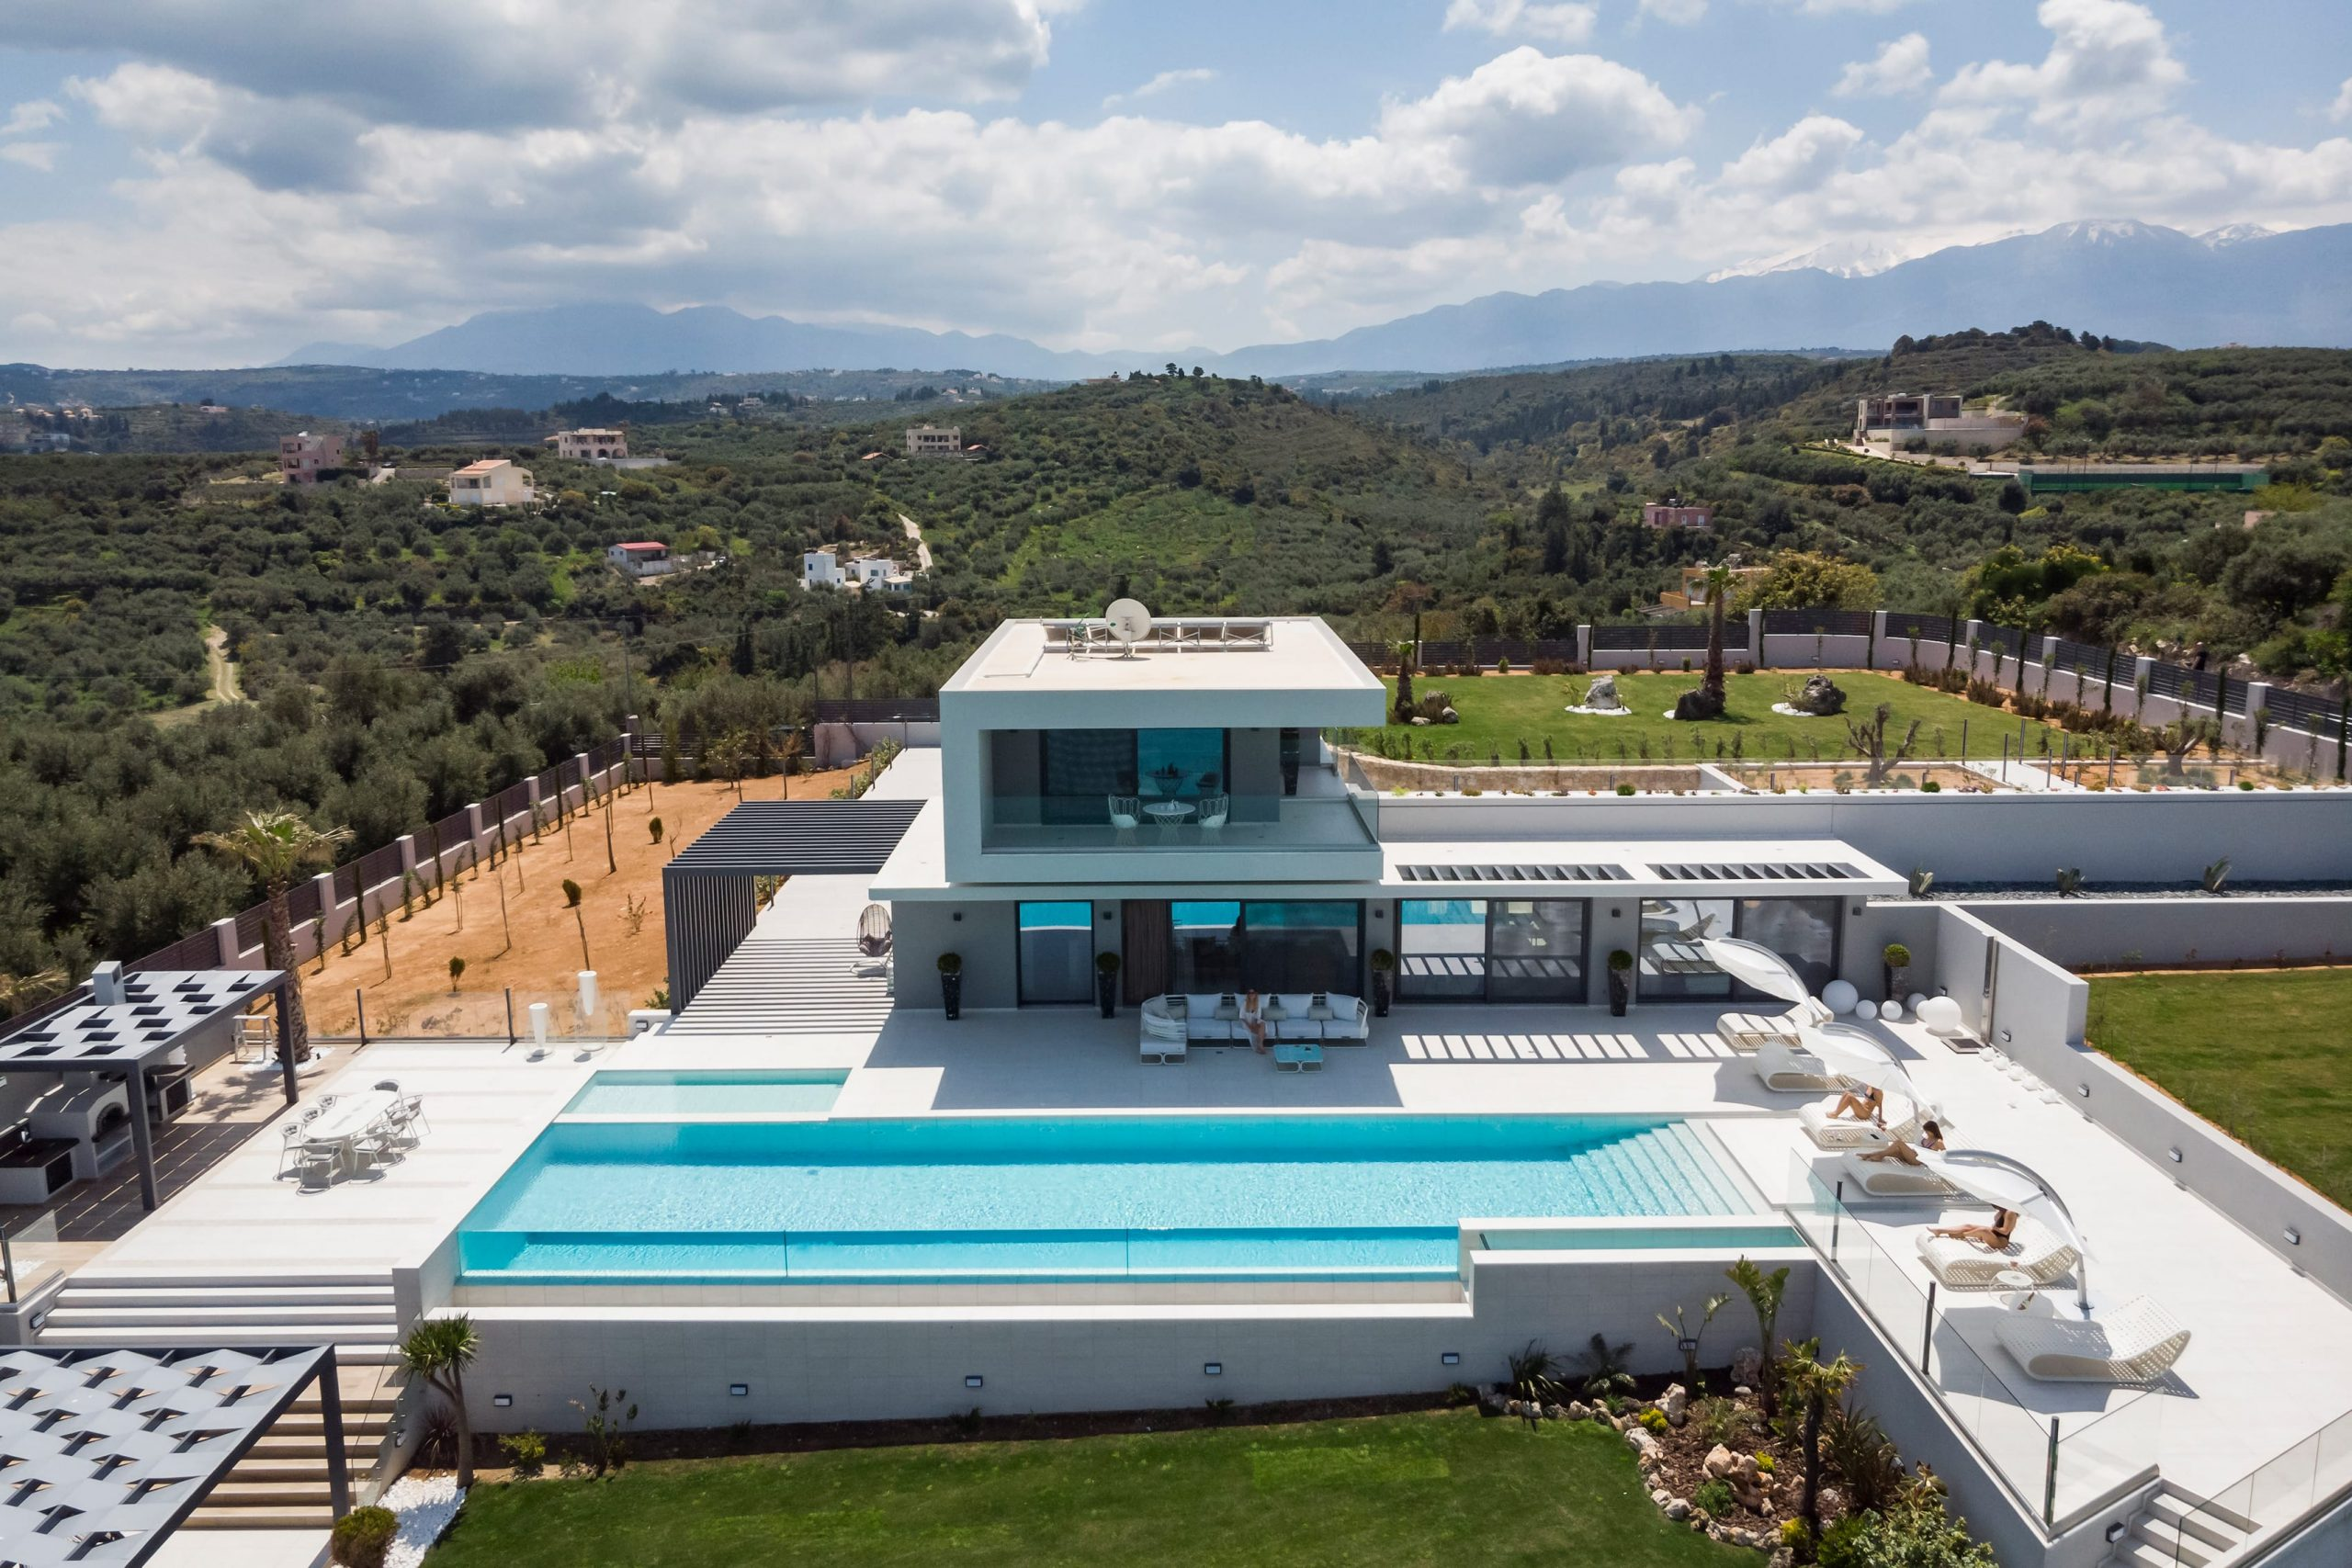 Villas in Chania- Luxury stone houses in Chania Crete